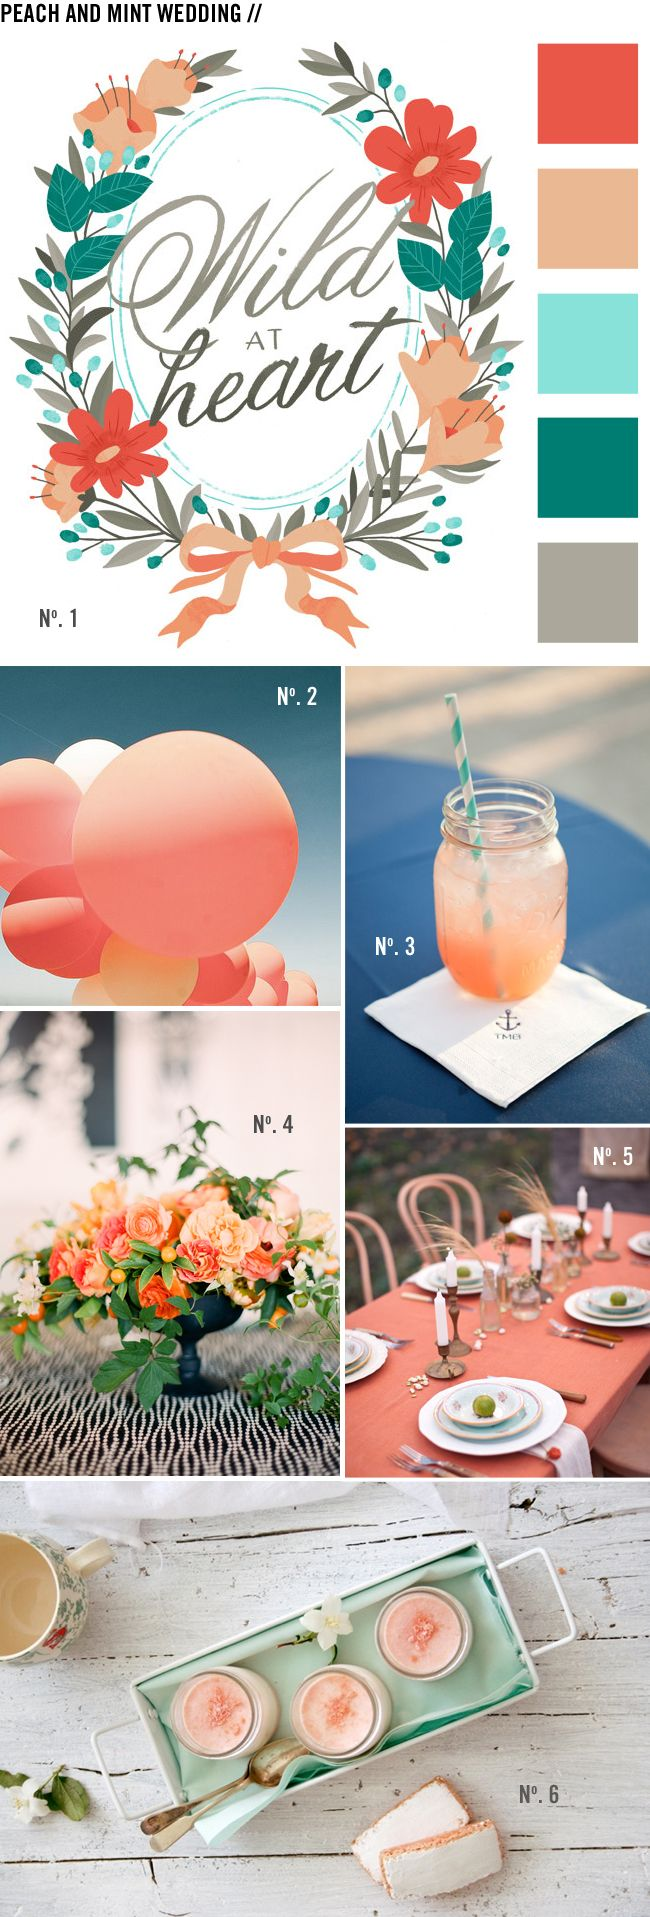 Peach + Mint Wedding Inspiration // LoveCreative Blog